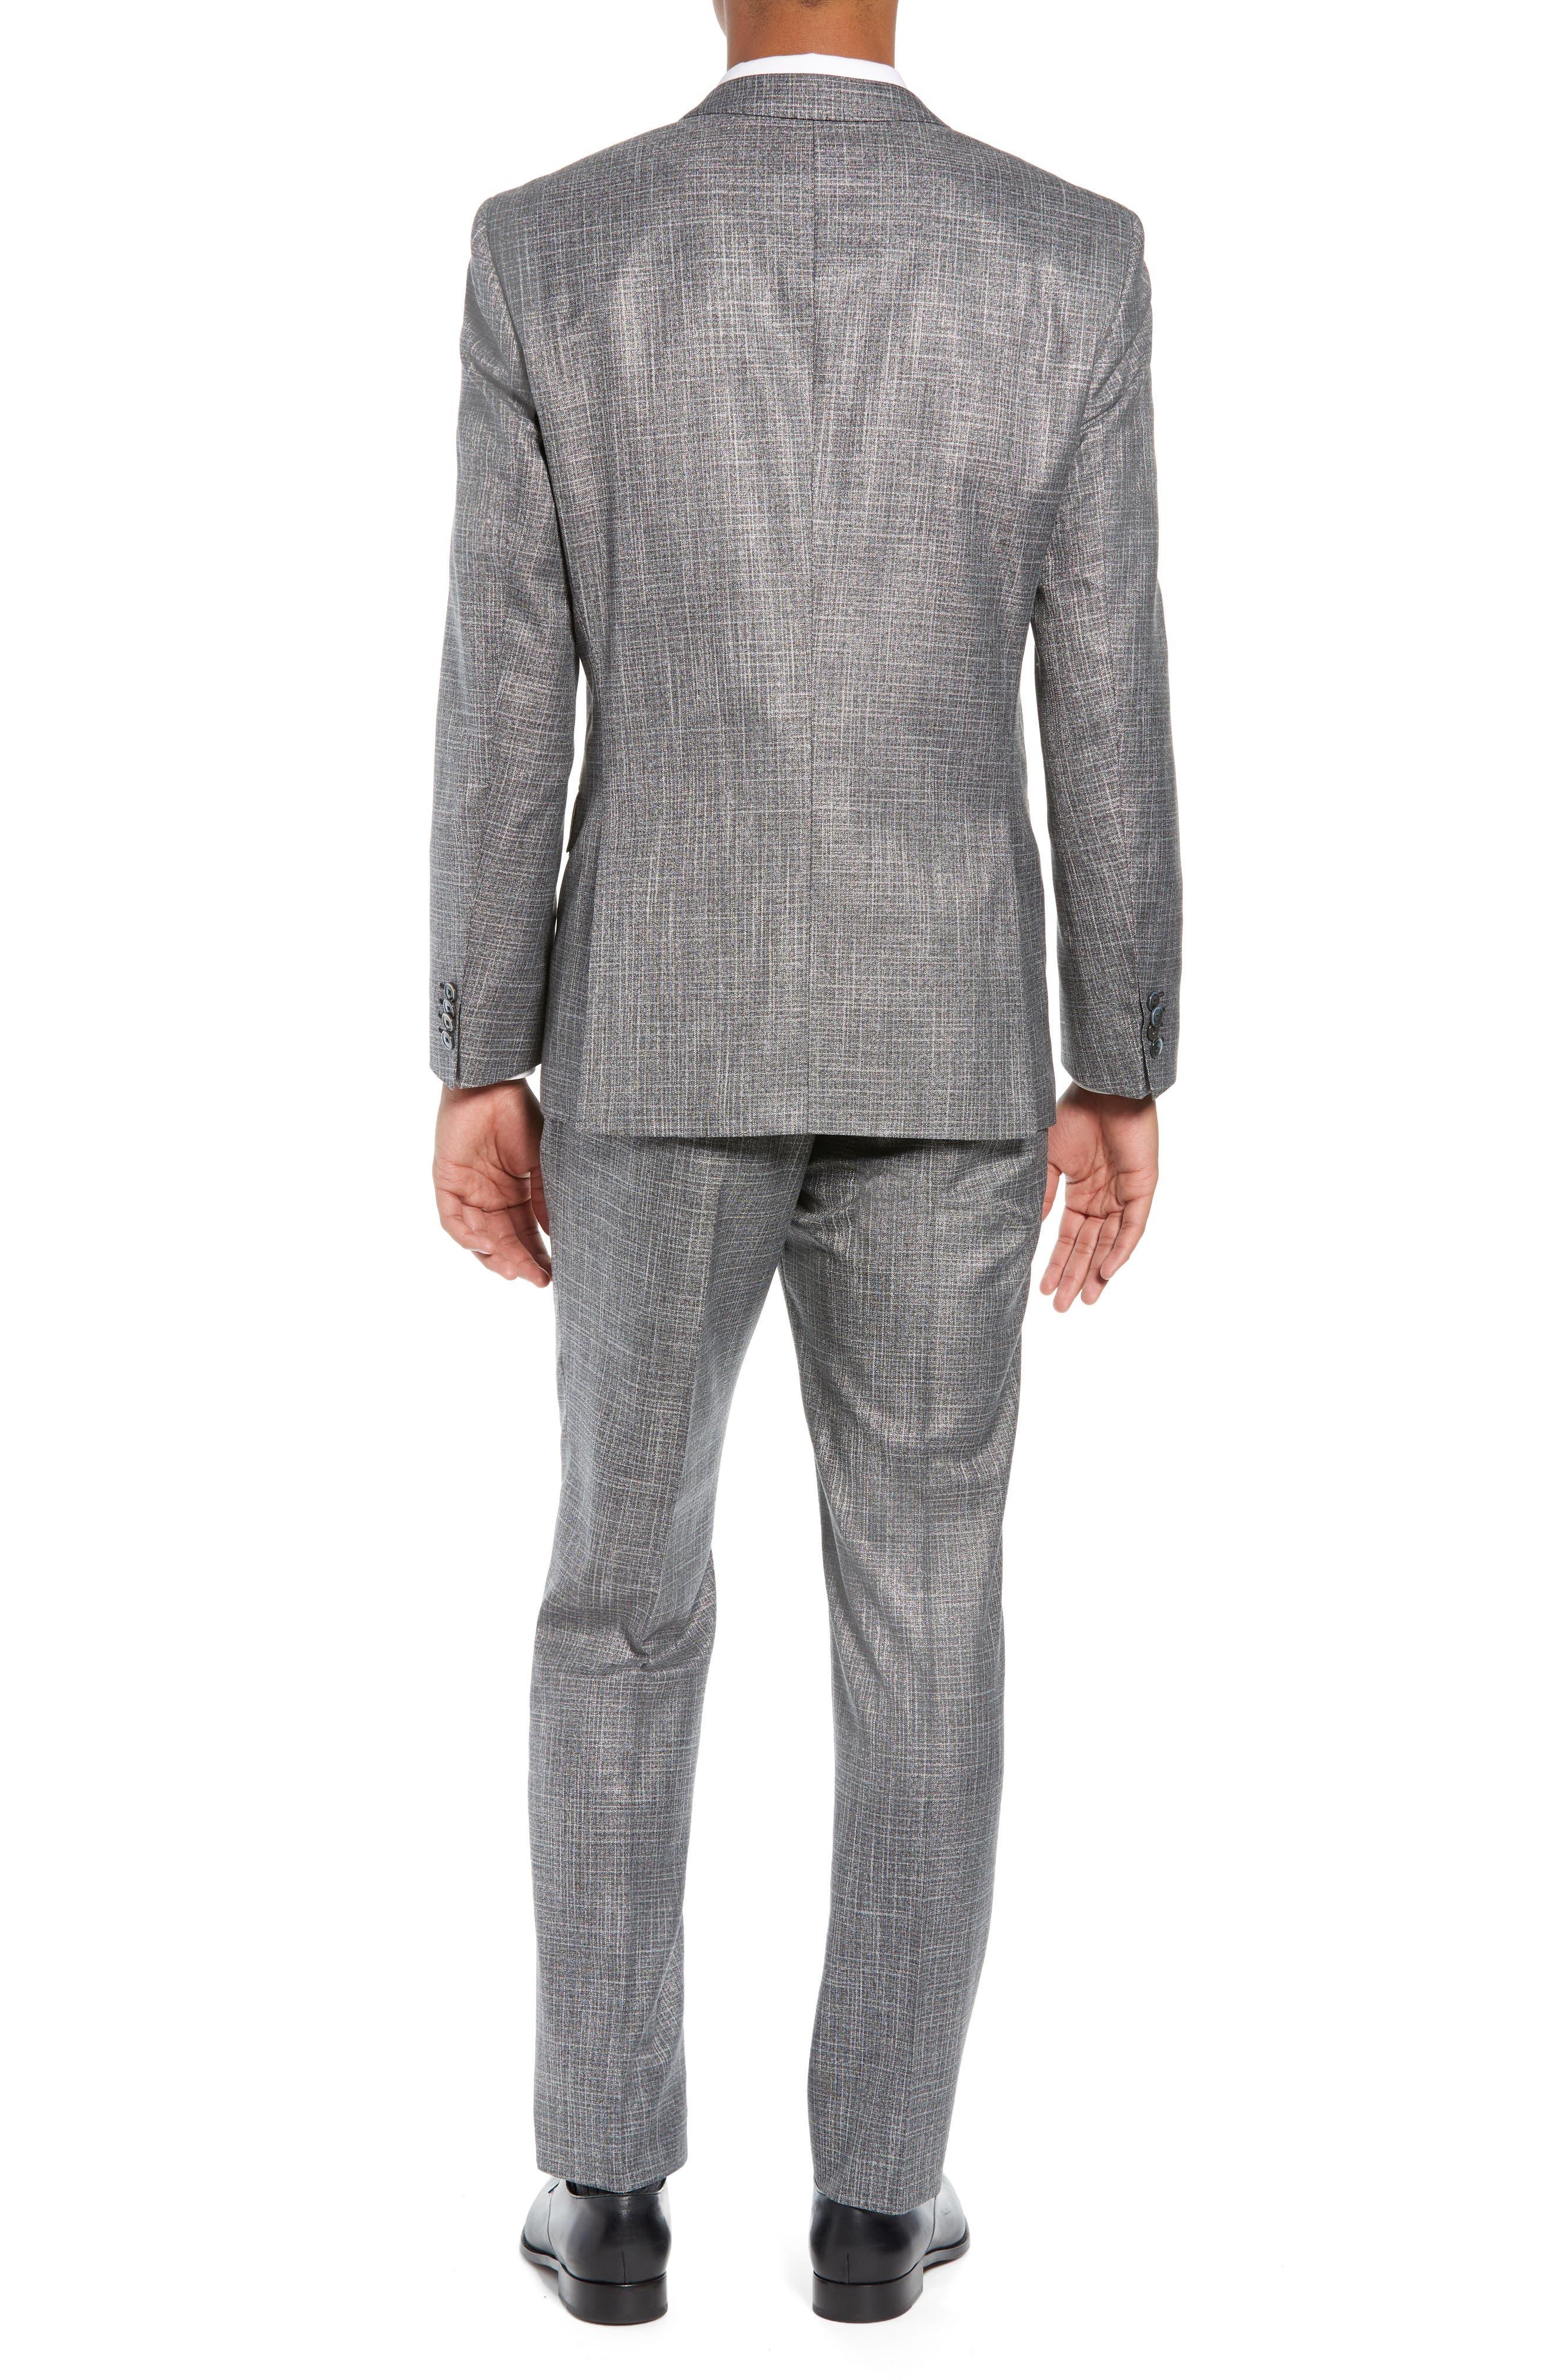 Hutson/Gander Trim Fit Solid Wool Blend Suit,                             Alternate thumbnail 2, color,                             MEDIUM GREY